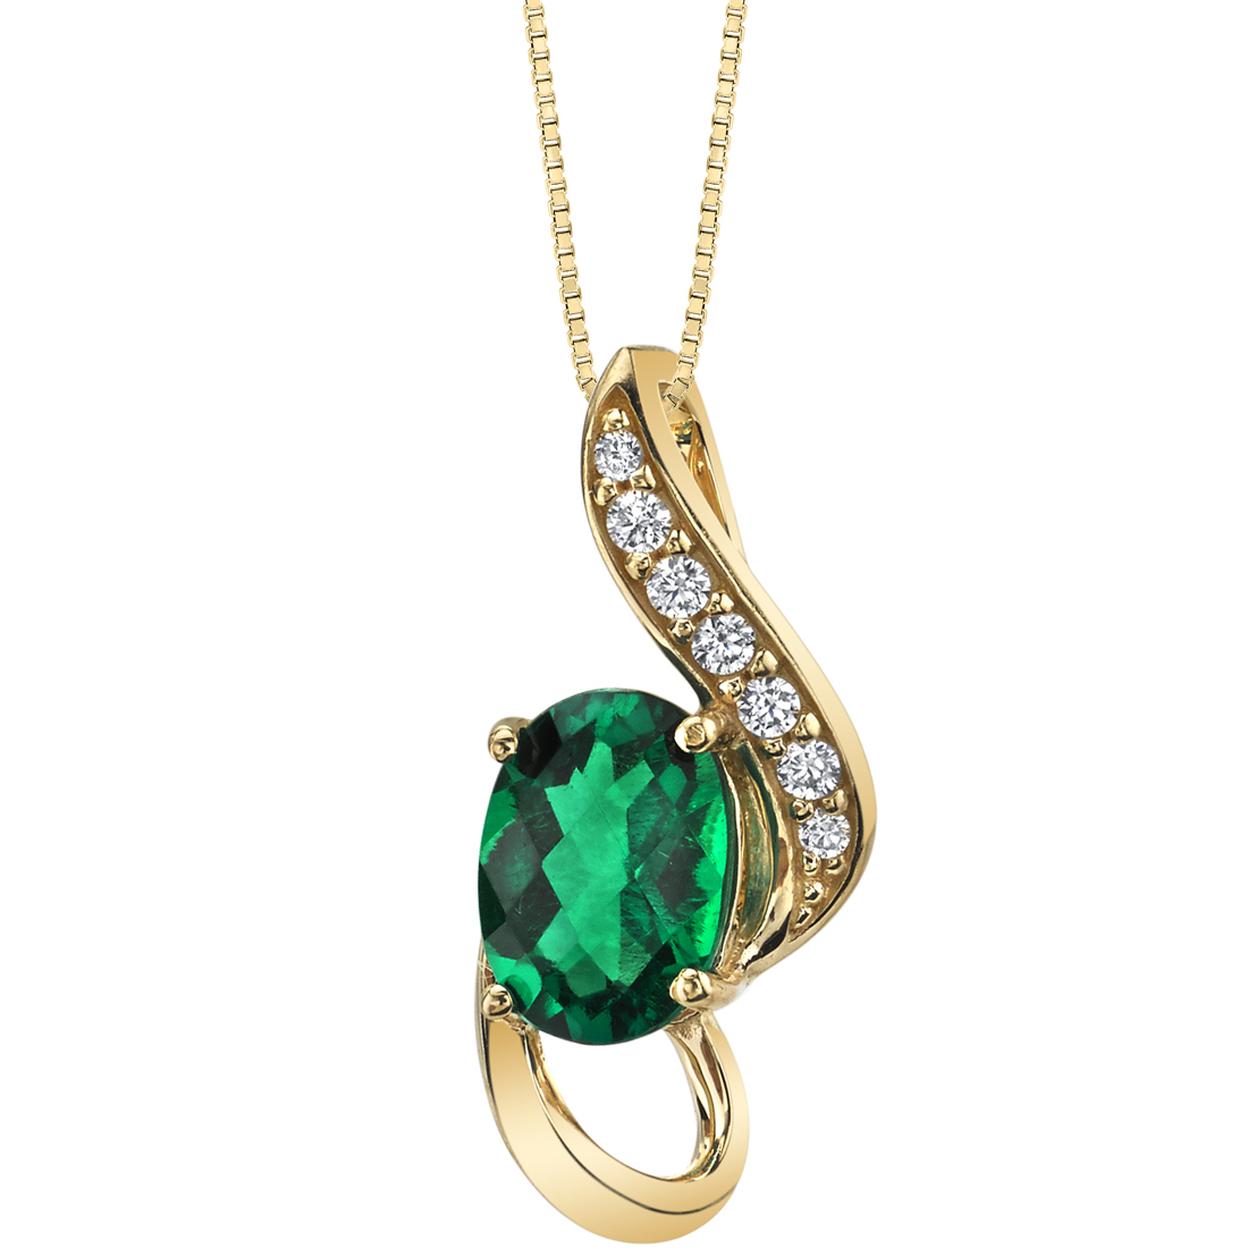 Oravo 14k Yellow Gold Created Emerald Slider Pendant 3/4 Carat